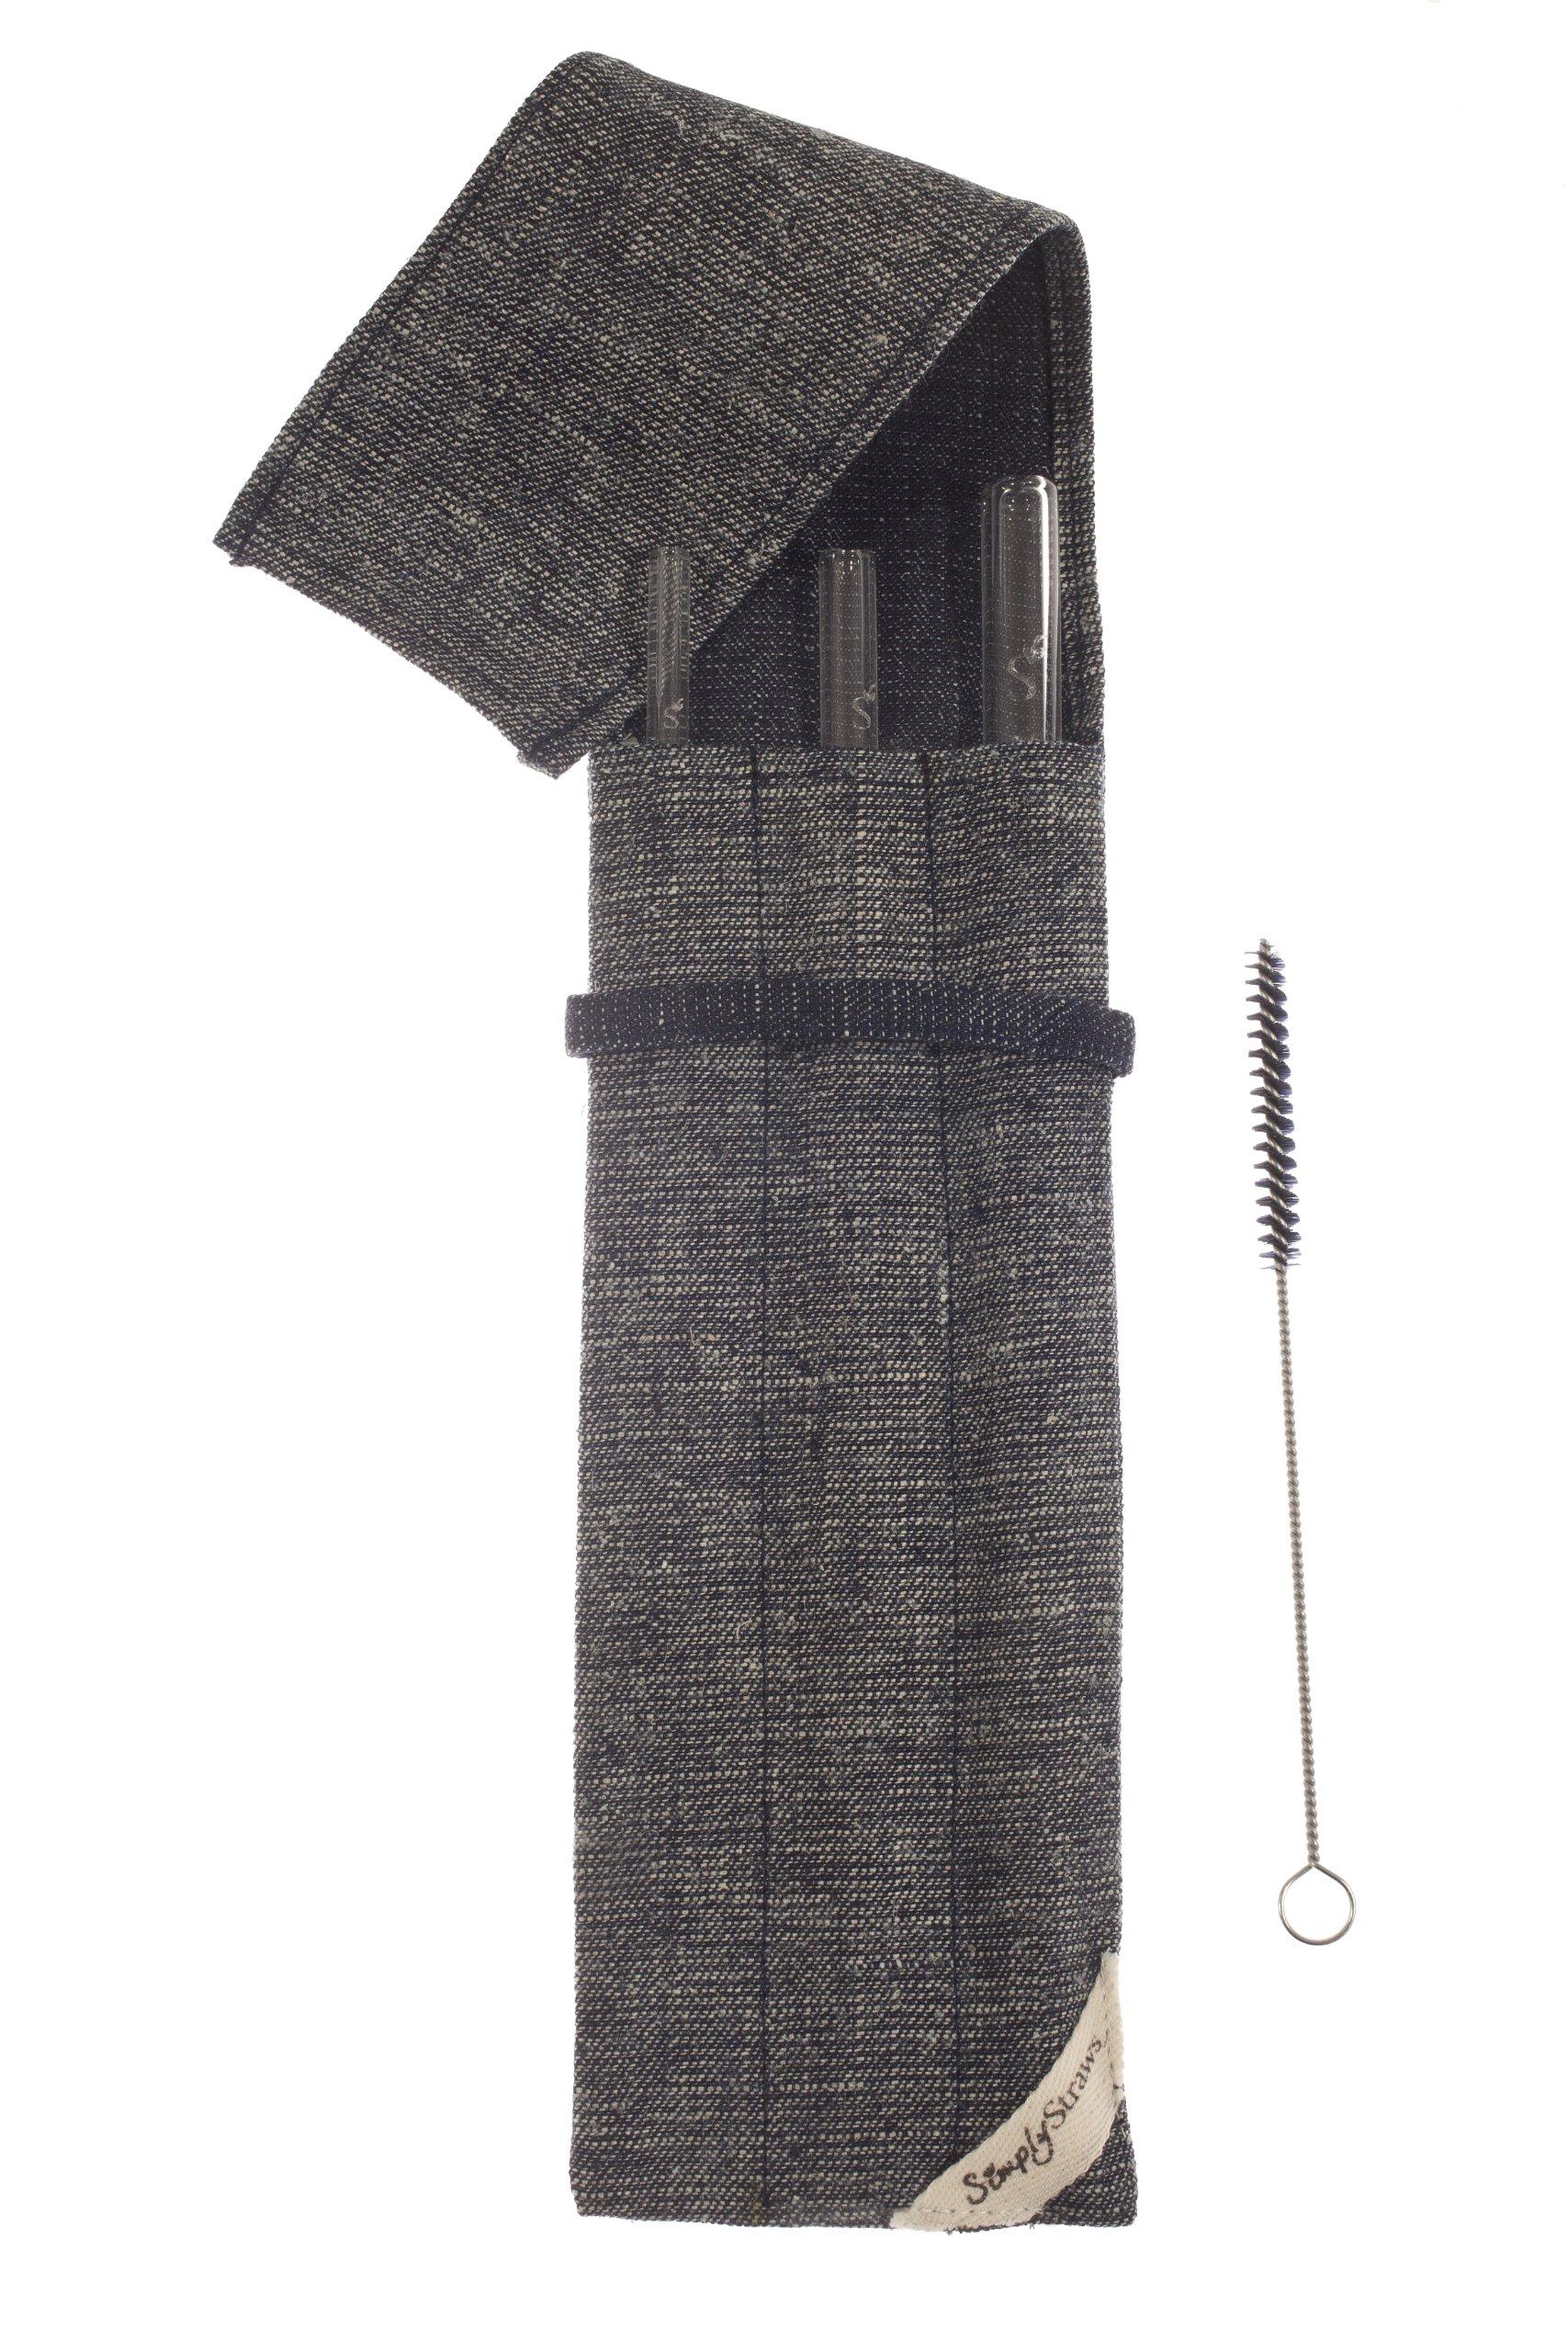 Simply Straws 3-Straw Reverse Denim Sleeve Set